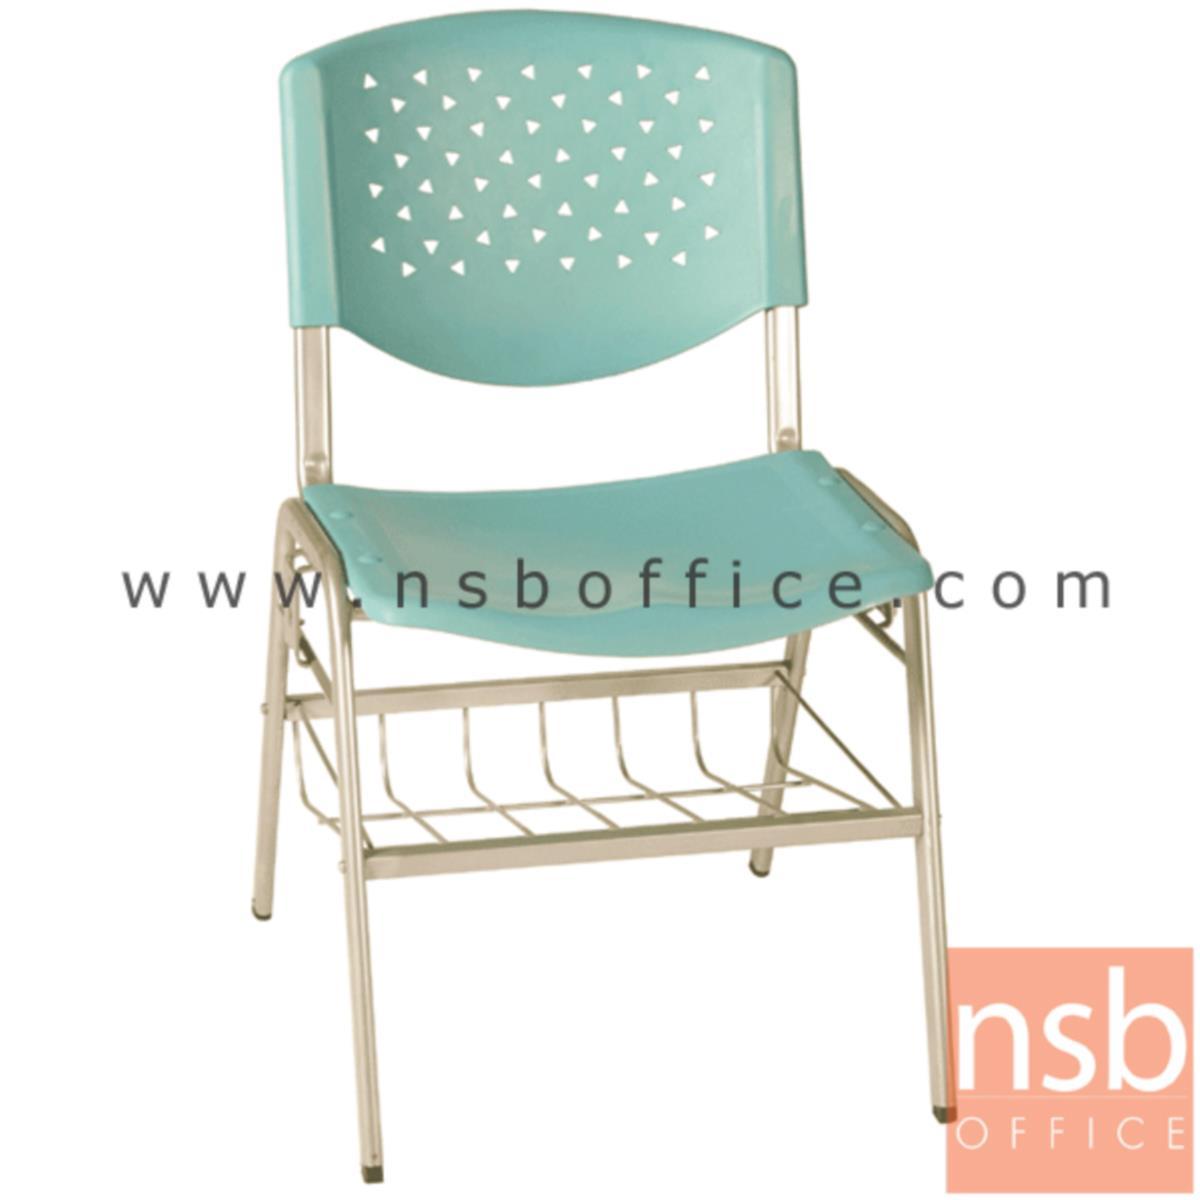 B05A042:เก้าอี้อเนกประสงค์เฟรมโพลี่ รุ่น A336-726  มีตะแกรงวางของ ขาเหล็ก